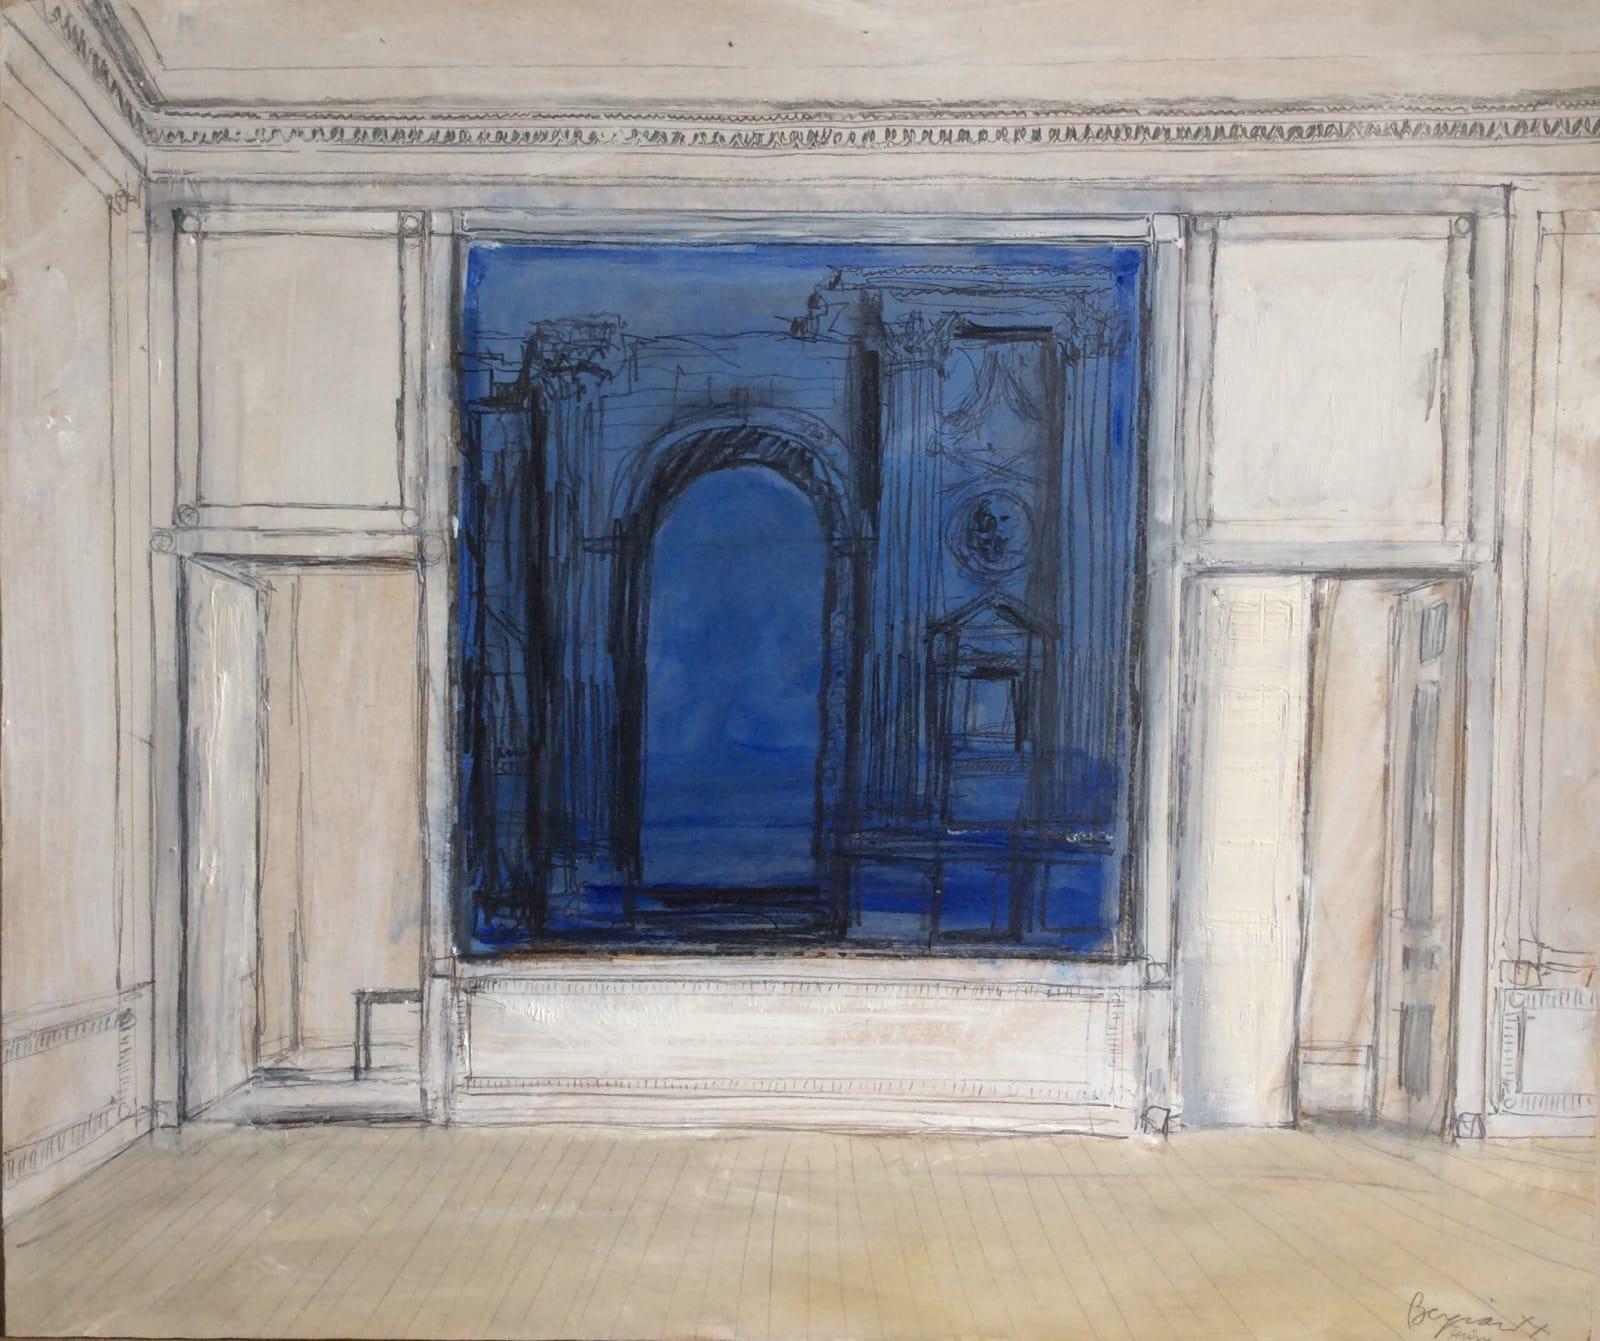 Romans in Rheims 2020 Oil on panel 44 x 52 cm /17 x 20.5 in